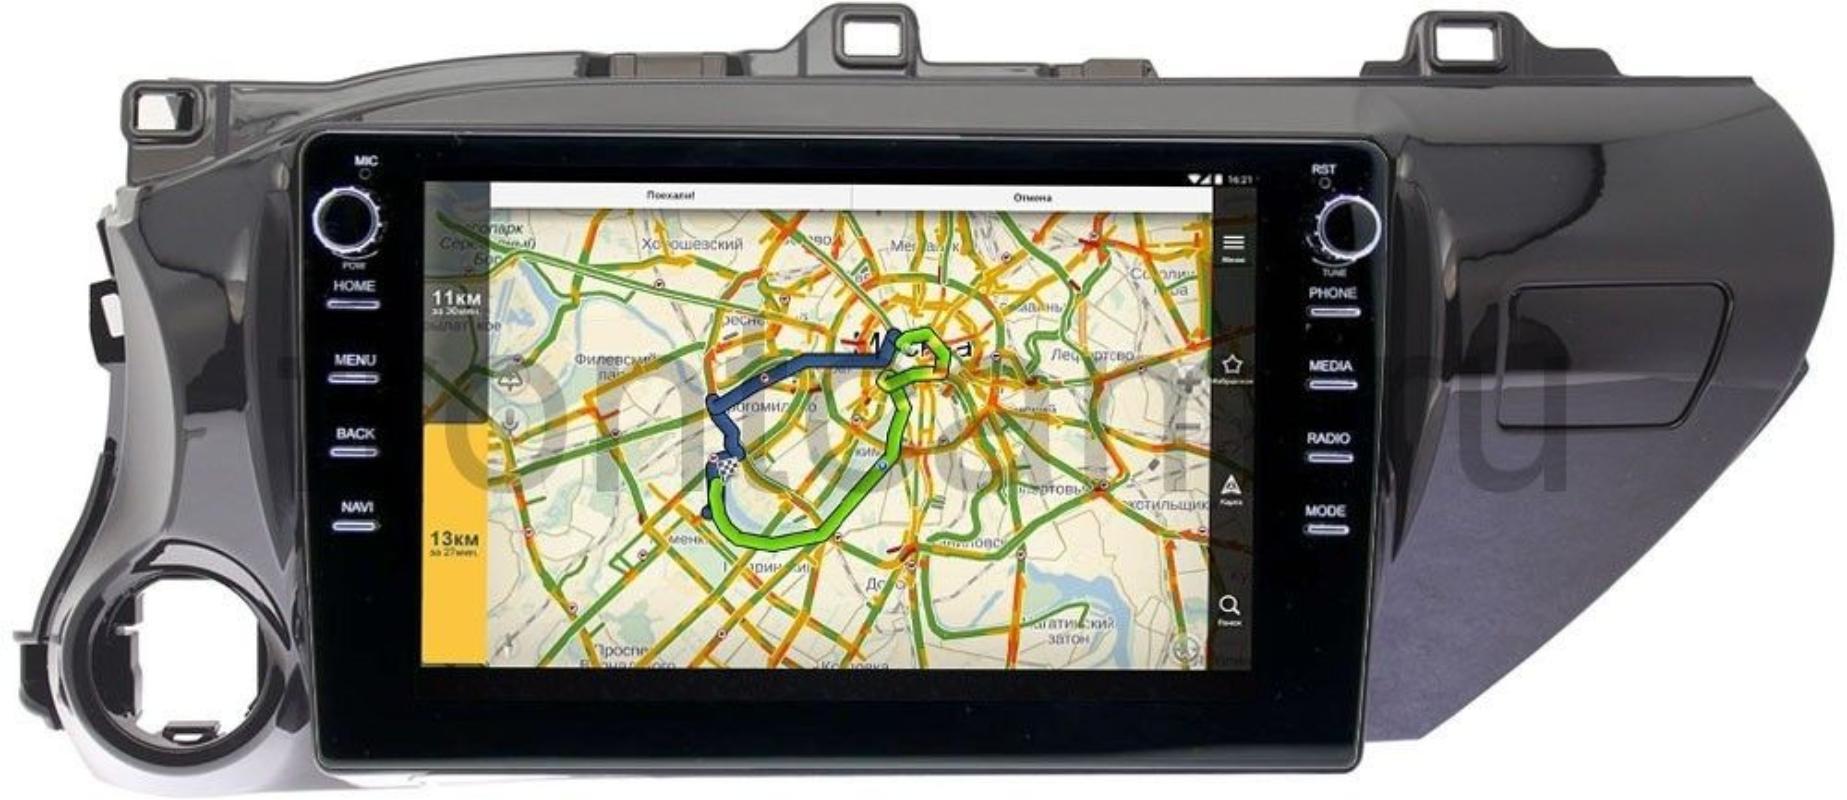 Штатная магнитола Toyota Hilux VIII 2015-2021 LeTrun 3149-1071 на Android 10 (DSP 2/16 с крутилками) (для авто без магнитолы) (+ Камера заднего вида в подарок!)